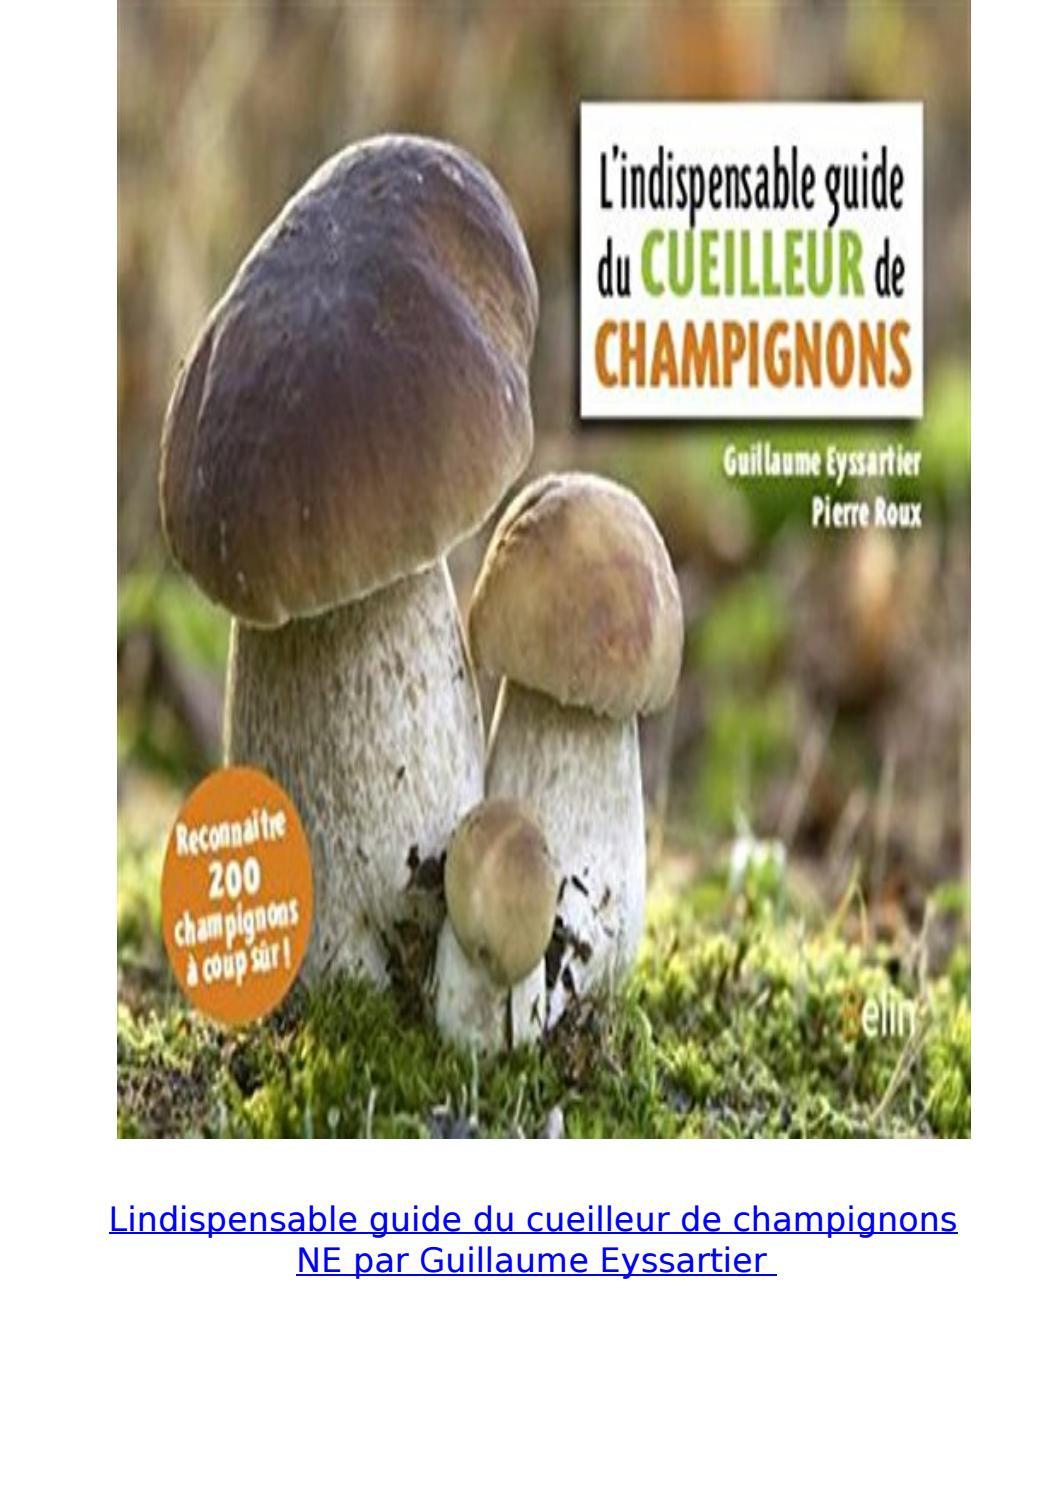 L'indispensable Guide Du Cueilleur De Champignons : l'indispensable, guide, cueilleur, champignons, Lindispensable, Guide, Cueilleur, Champignons, Guillaume, Eyssartier, Susan.reichert.1974, Issuu